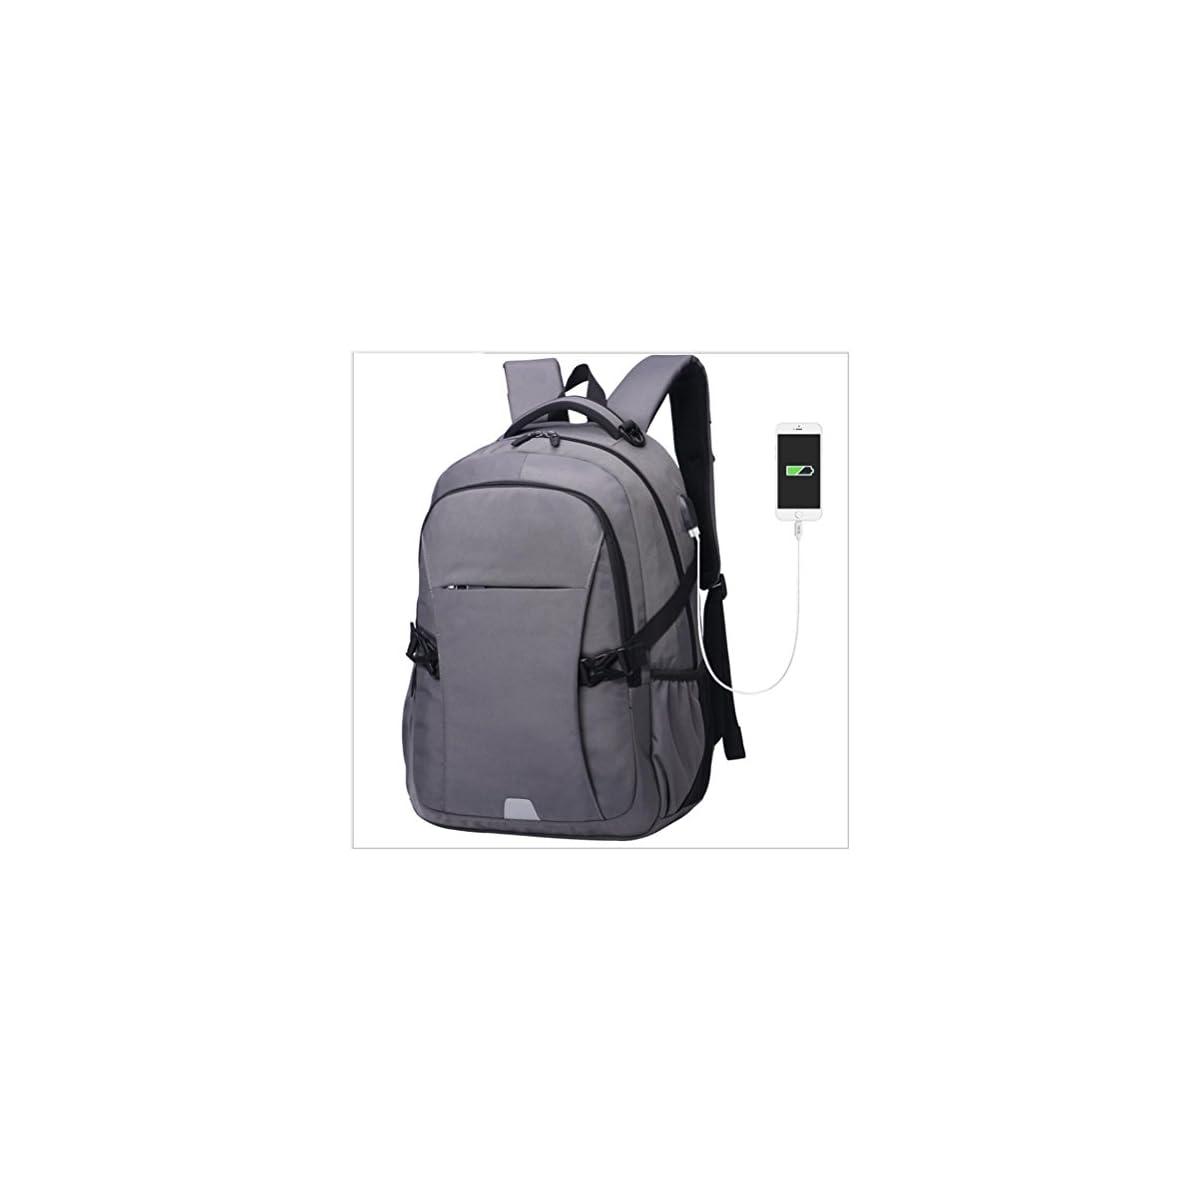 41pIHEbMHiL. SS1200  - Beibao Mochila para portátil Mochilas para Viaje de Negocios Backpack con Puerto de Carga USB